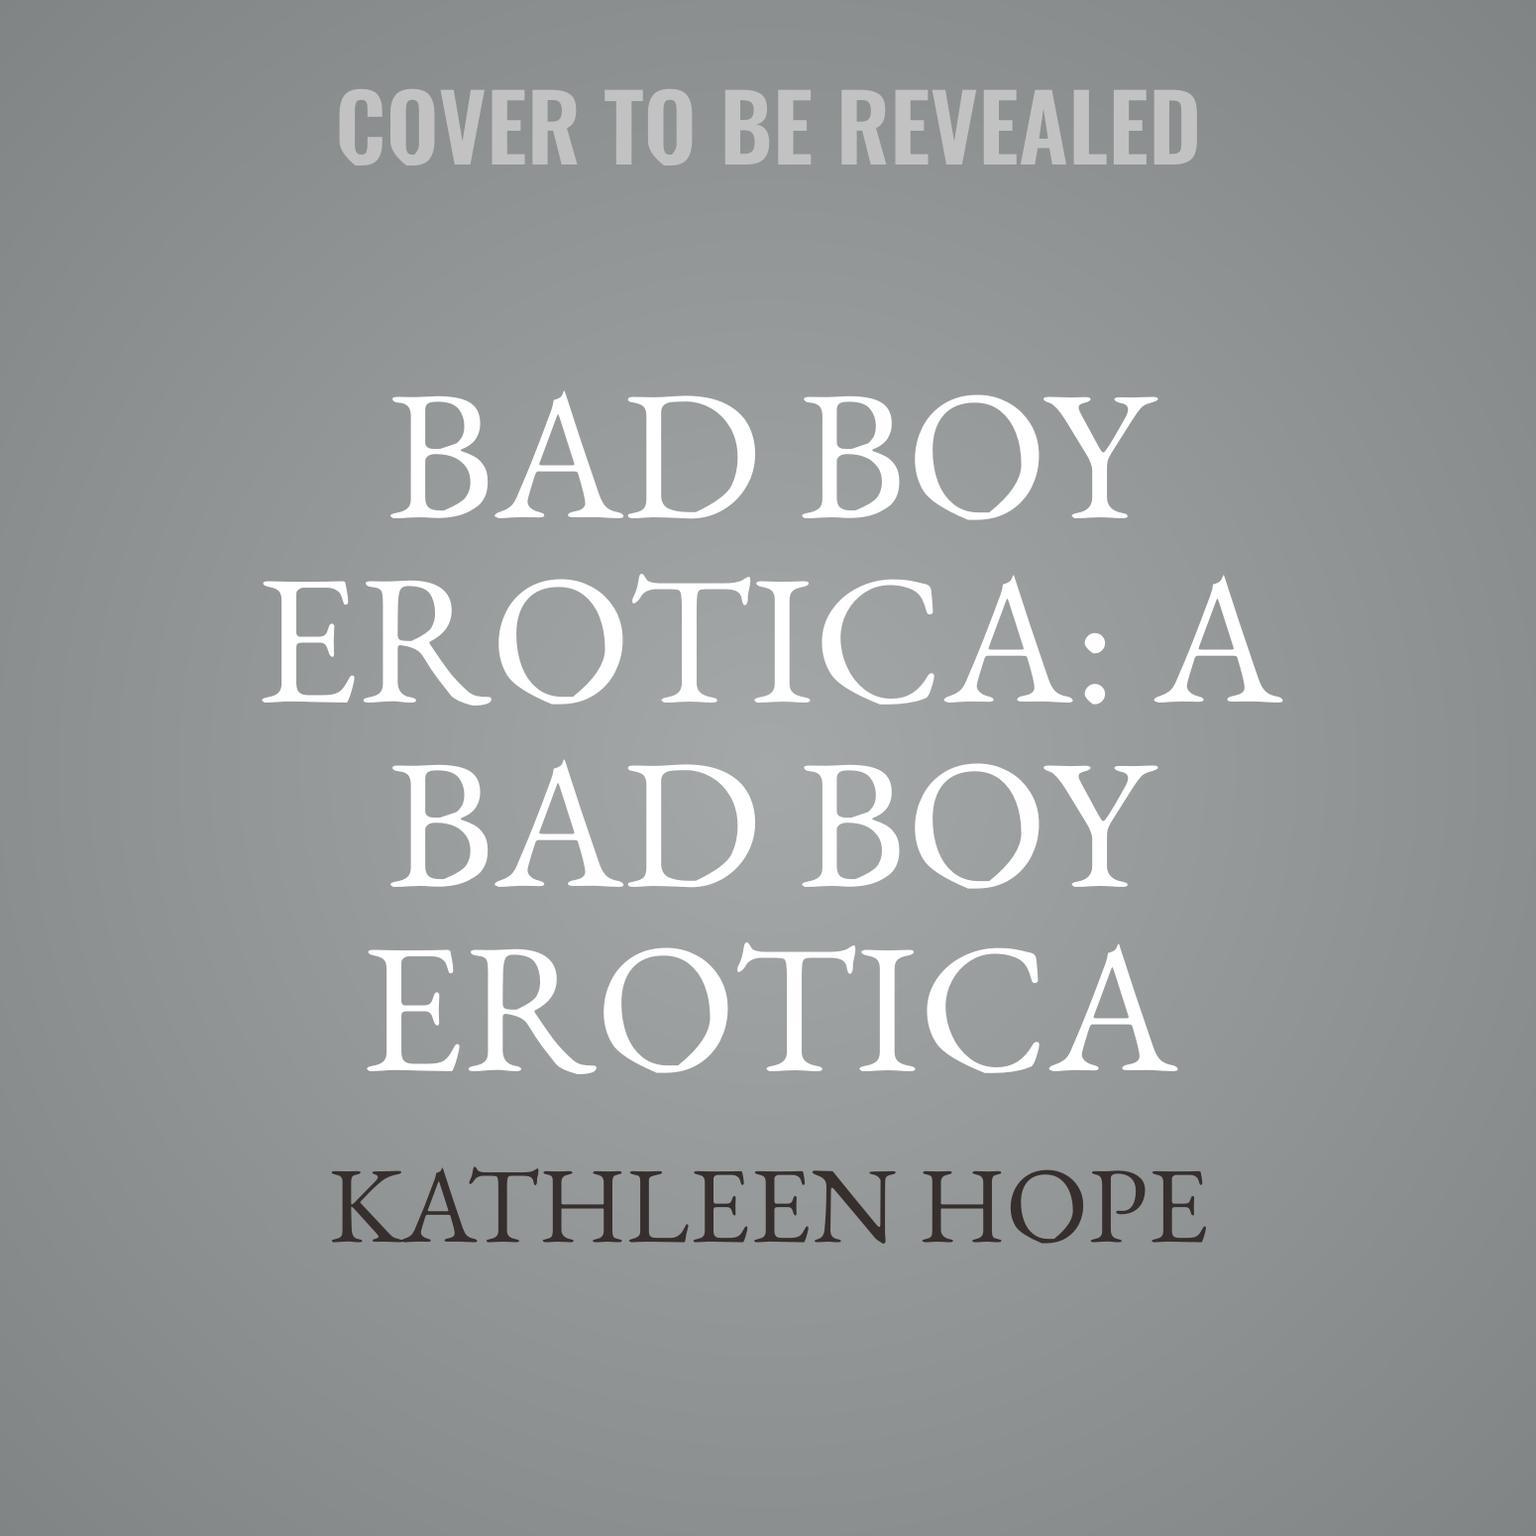 Bad Boy Erotica: A Bad Boy Erotica Short Story Audiobook, by Kathleen Hope